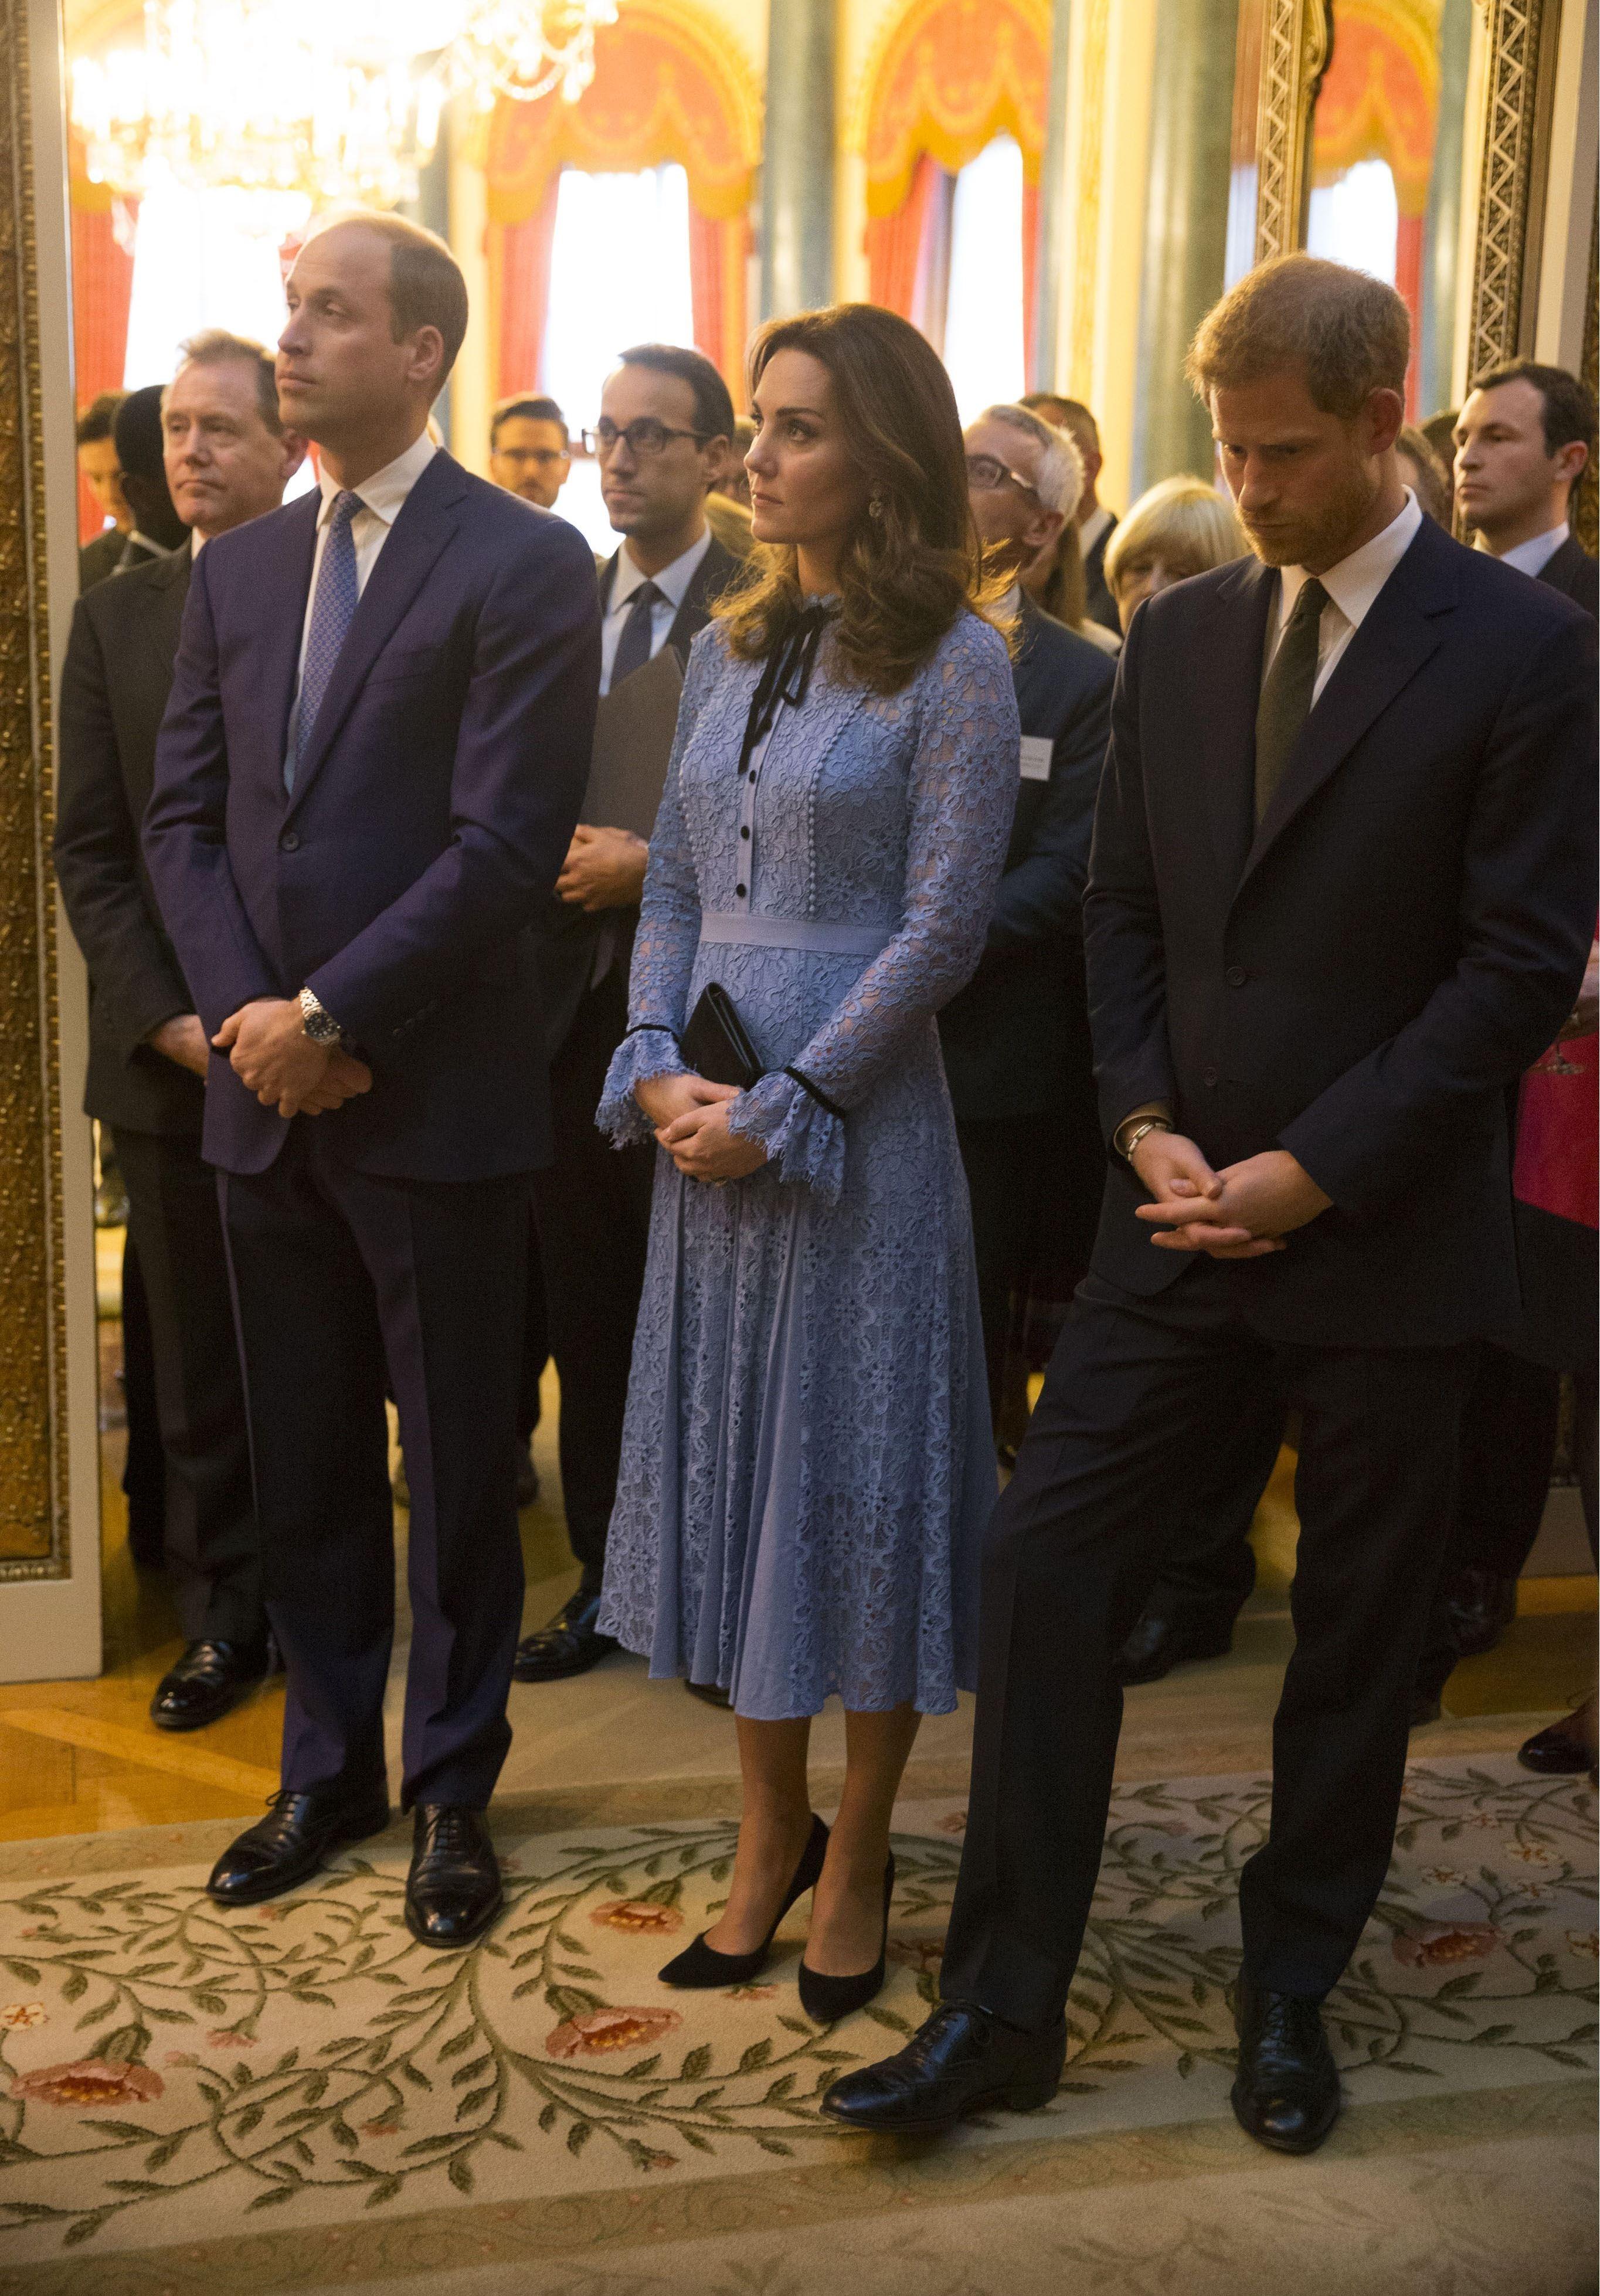 prince_william_catherine_duchess_of_cambridge1